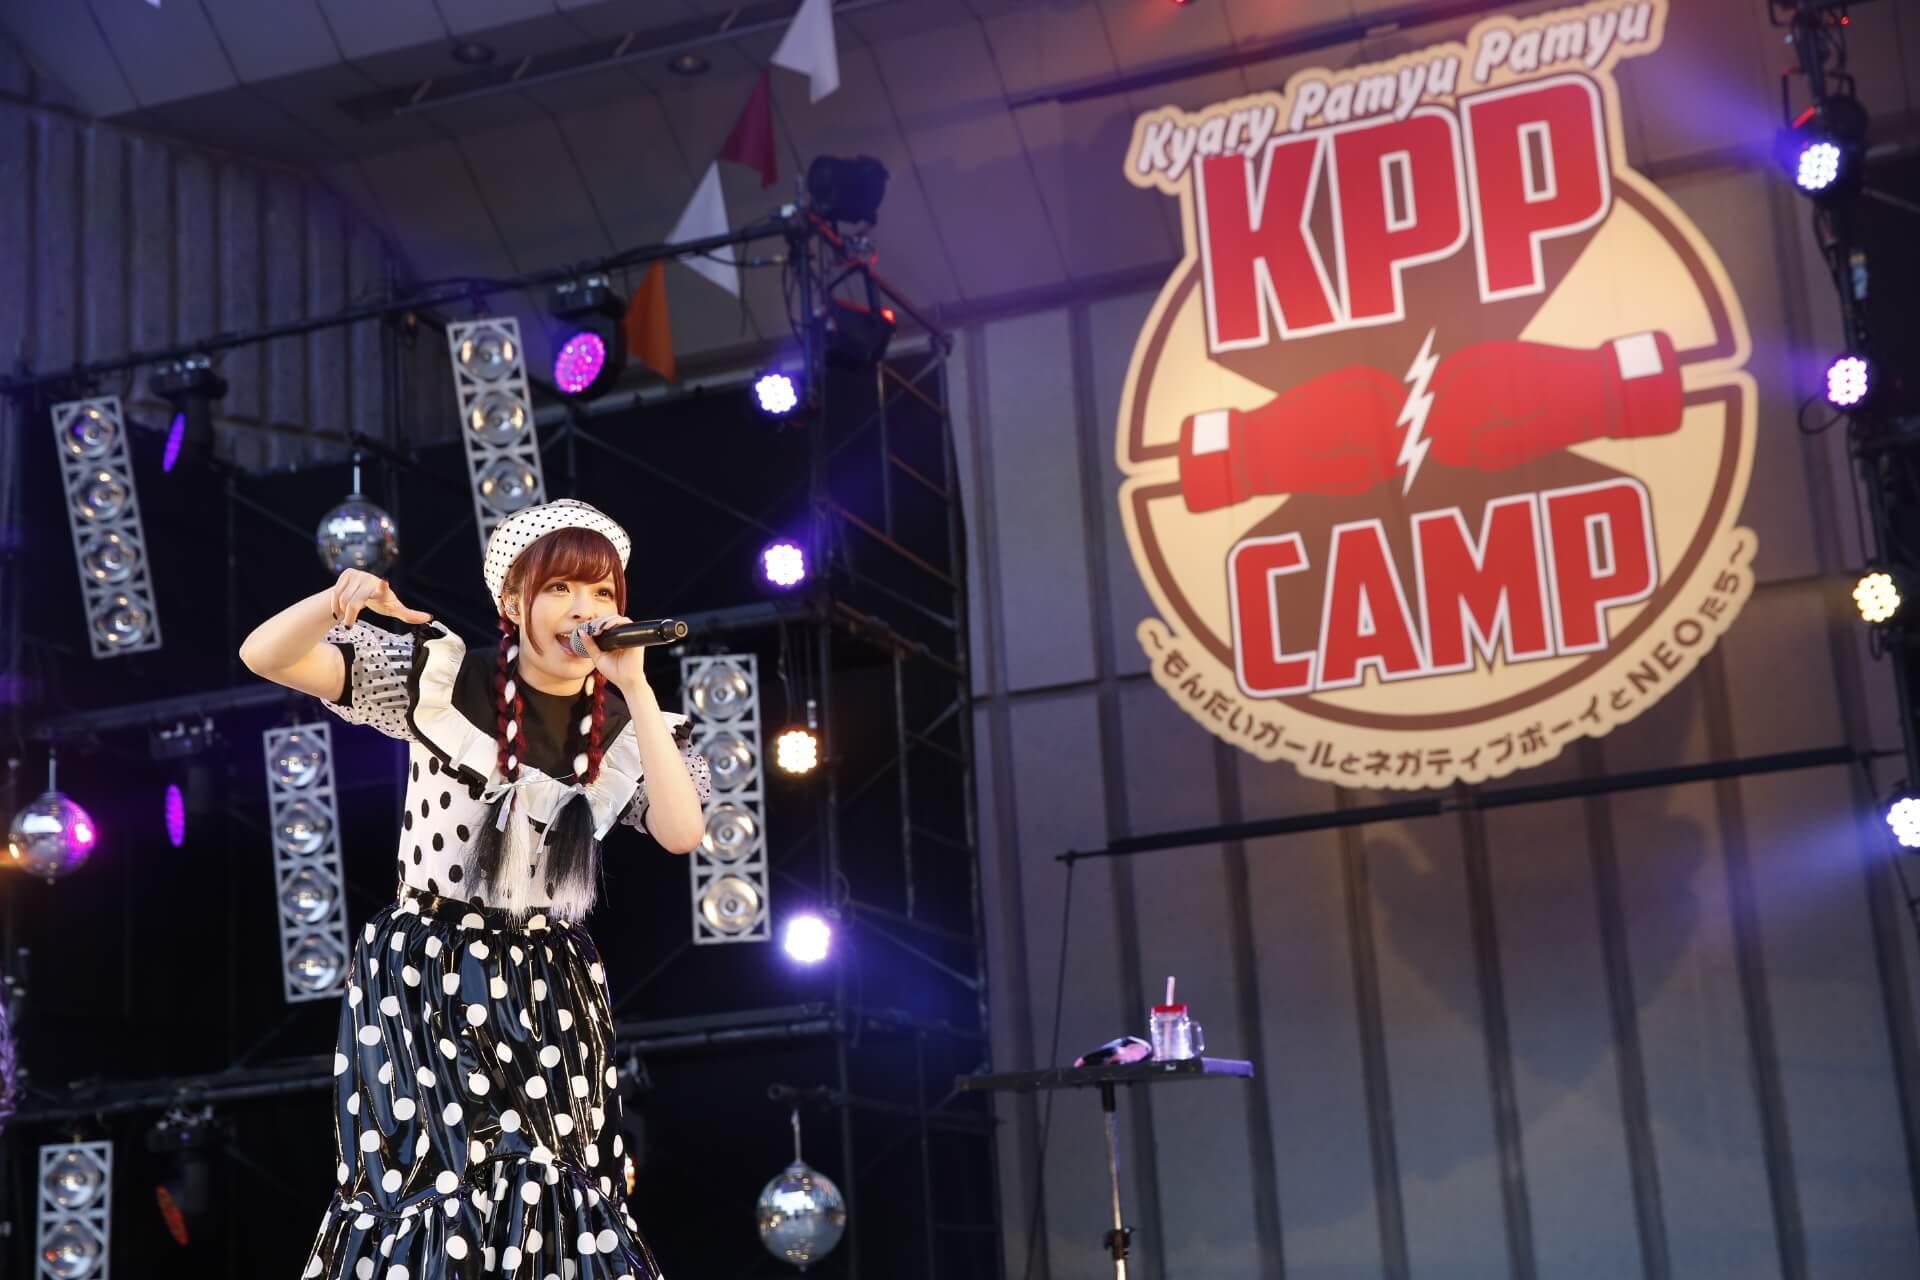 KPP CAMP きゃりーぱみゅぱみゅ 日比谷野音 2